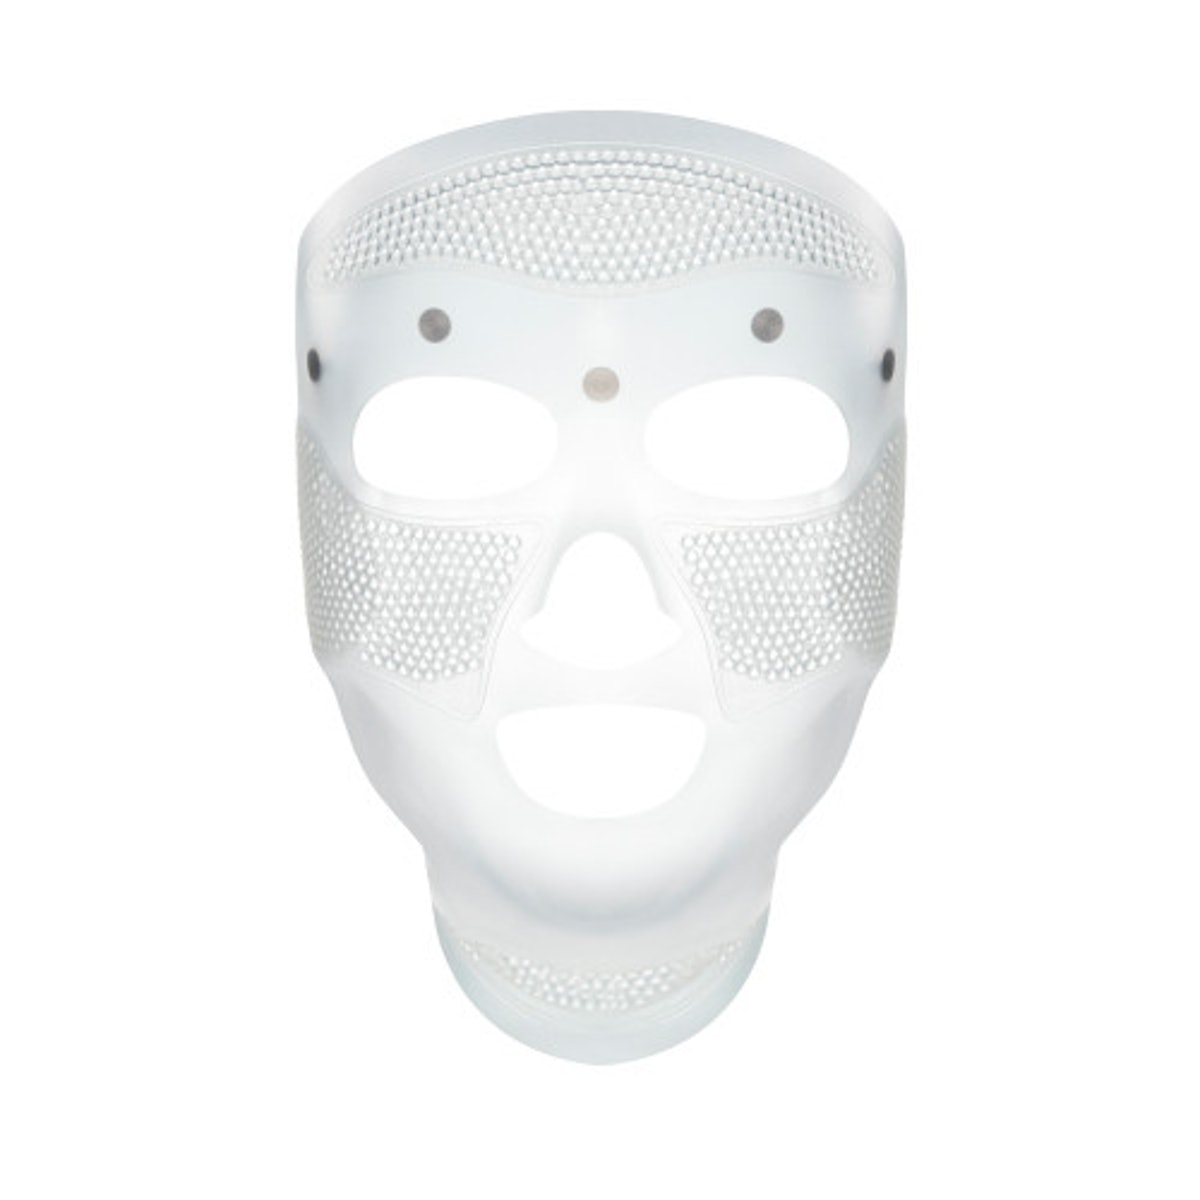 Cryo Recovery Mask